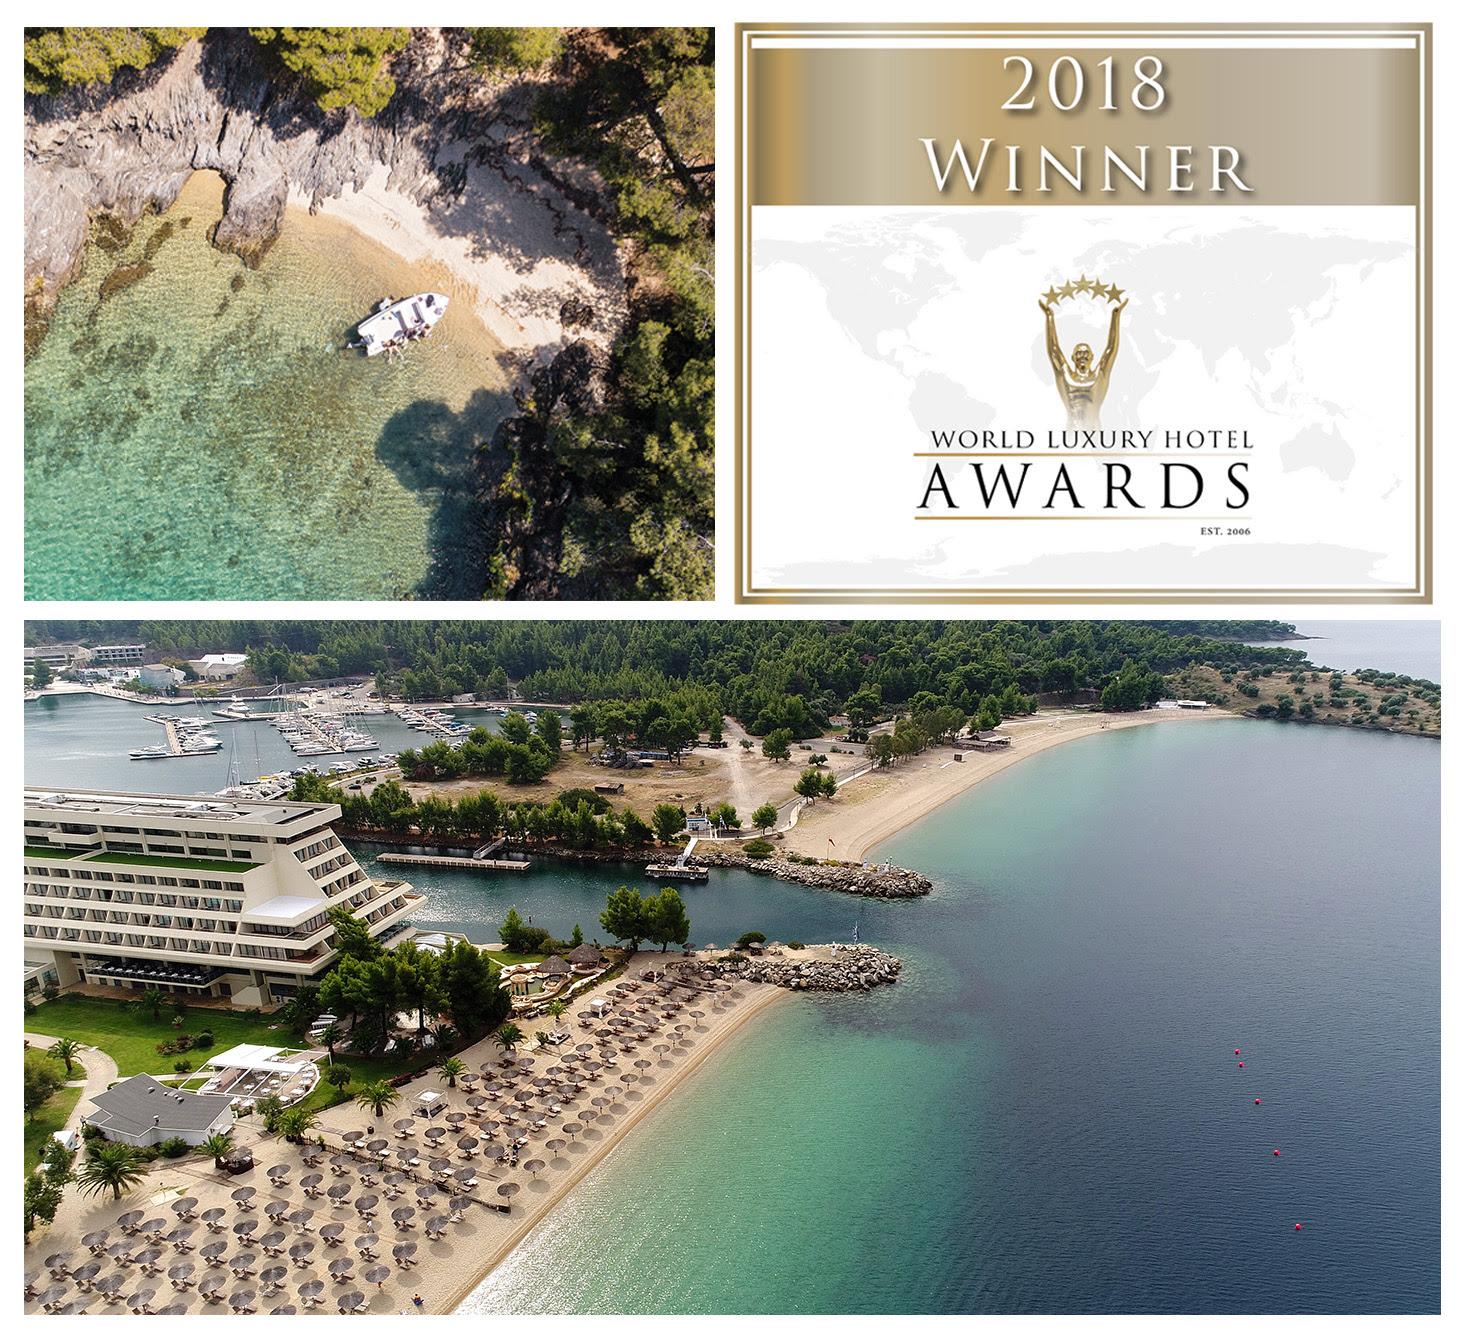 Tριπλή διεθνής βράβευση του Πόρτο Καρράς στα World Luxury Hotel Awards 2018!